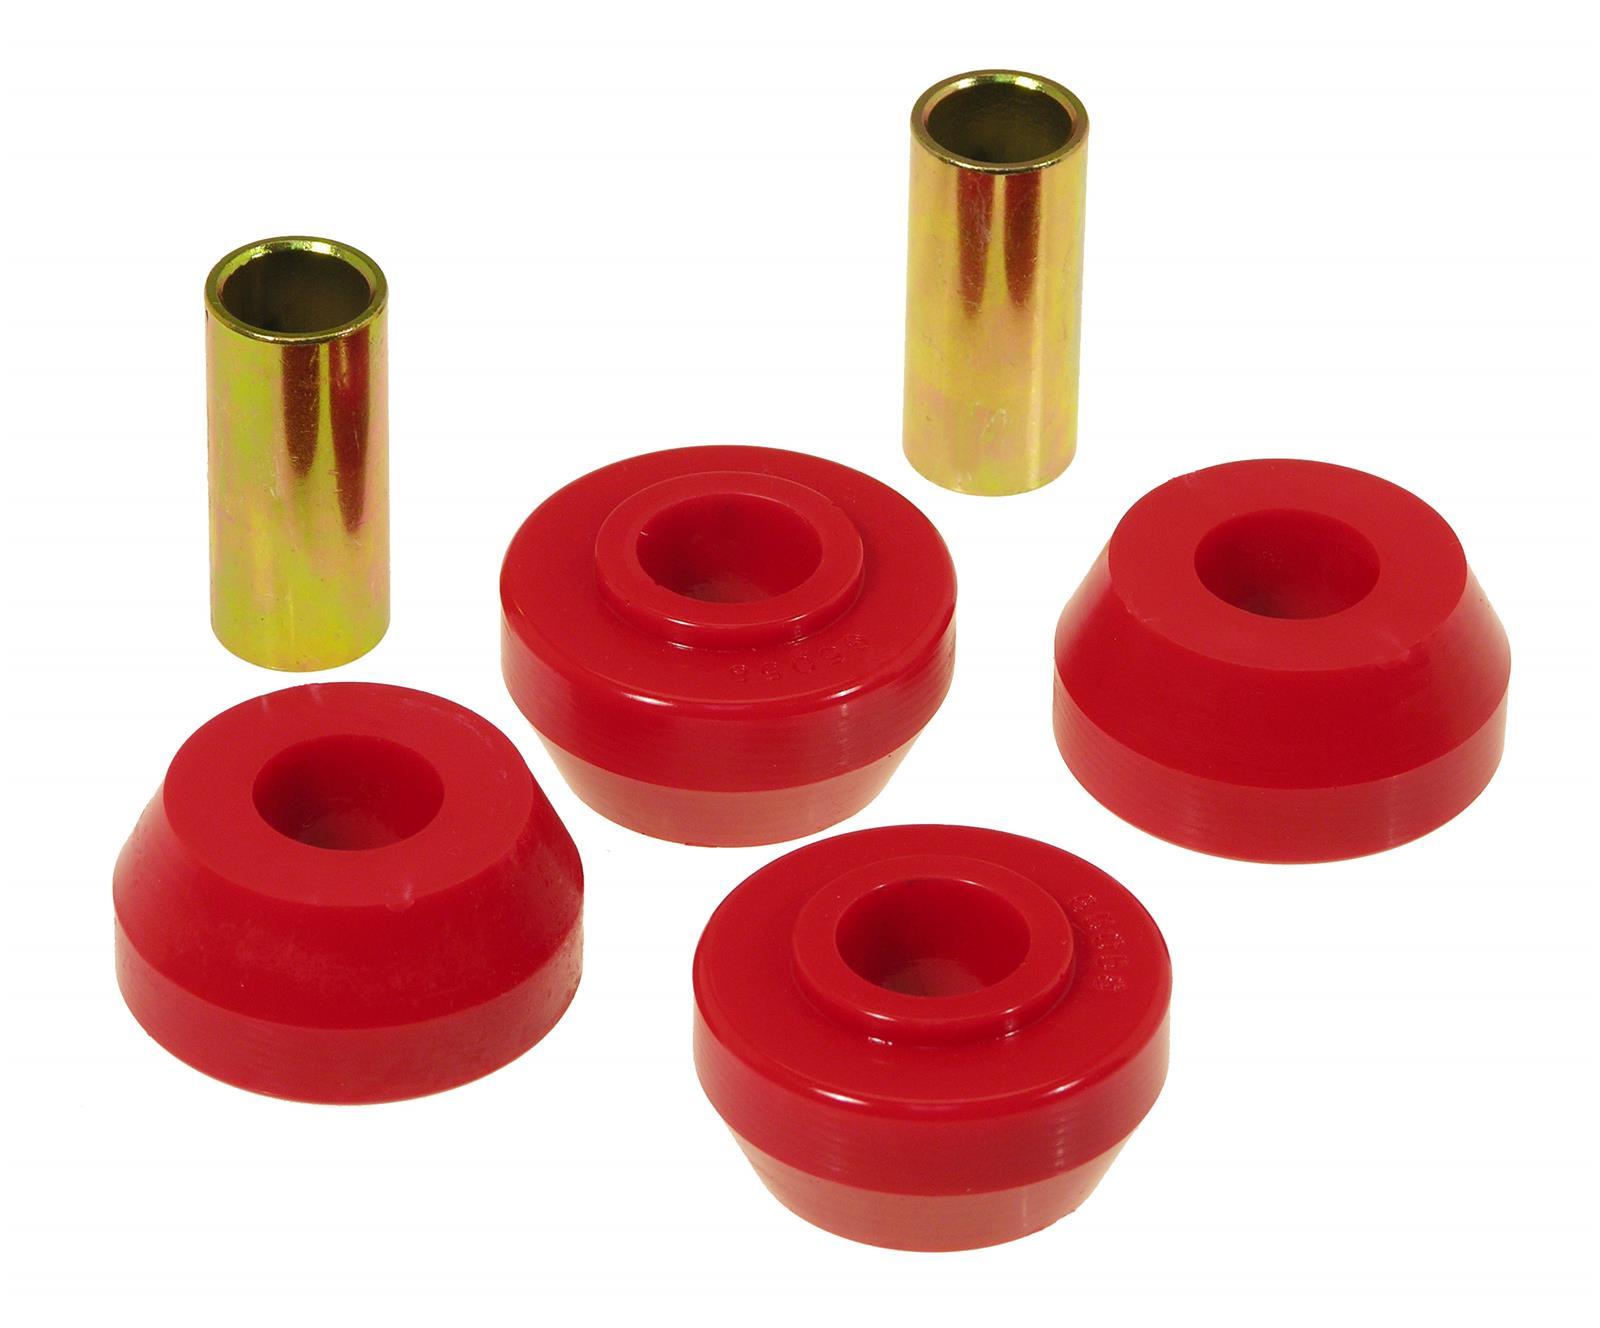 Prothane 4-1201 Red Strut Arm Bushing Kit